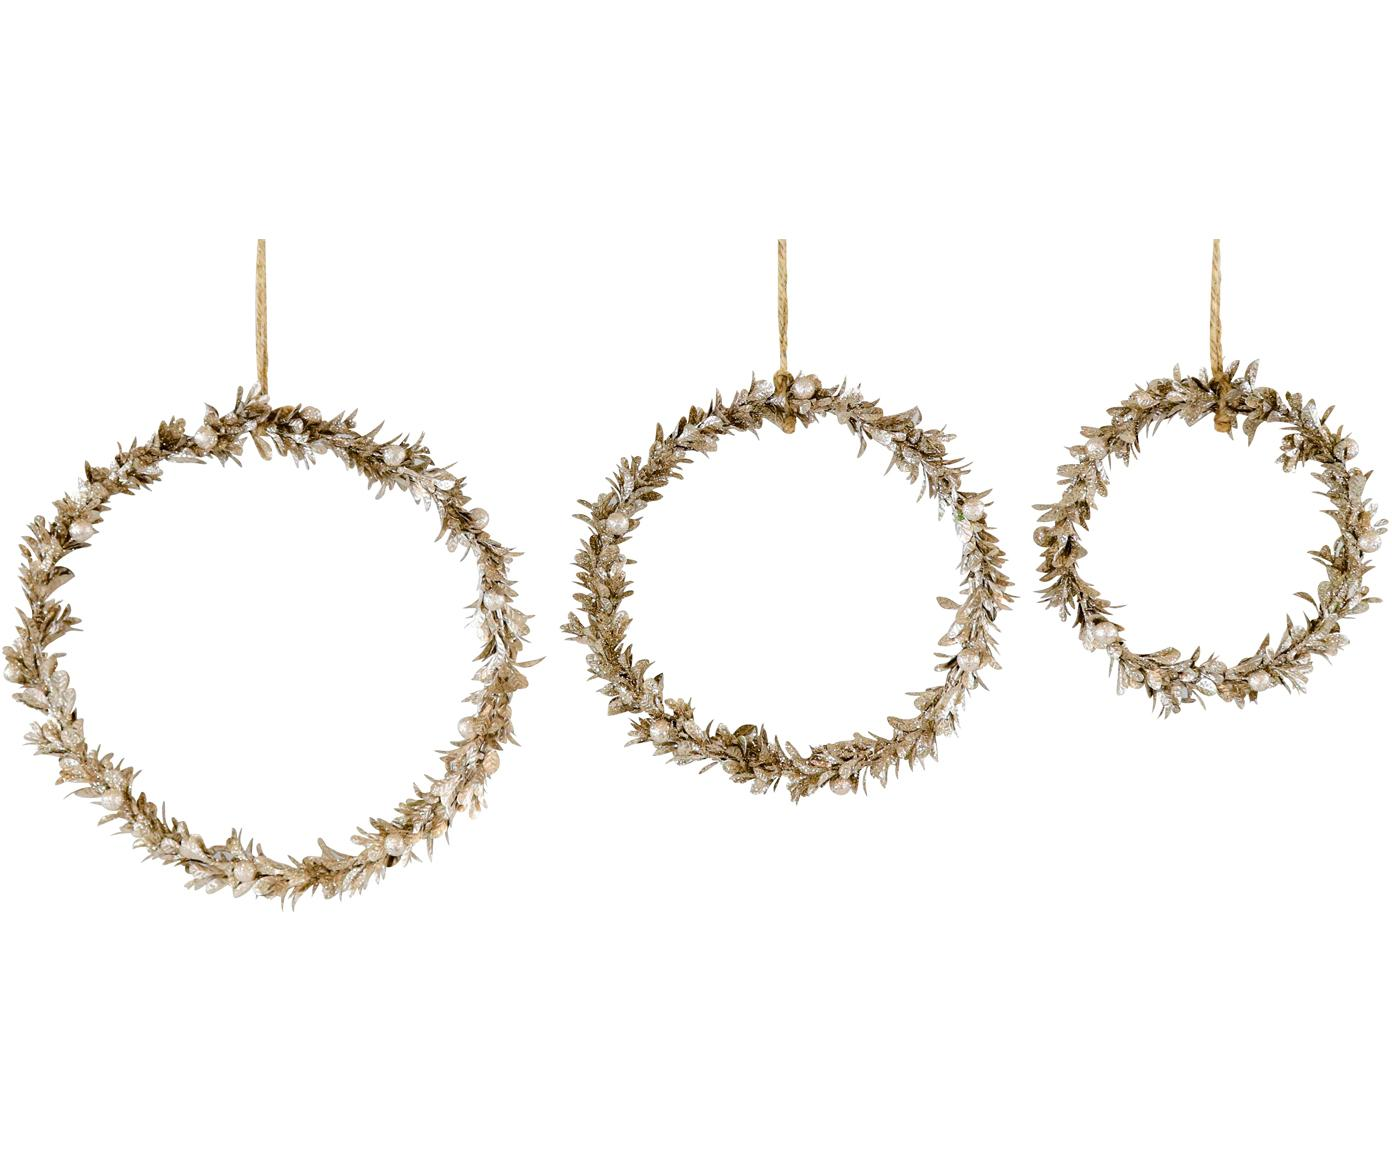 Set 3 ciondoli decorativi Laurel, Polistirolo, plastica, metallo, legno, Dorato, Set in varie misure